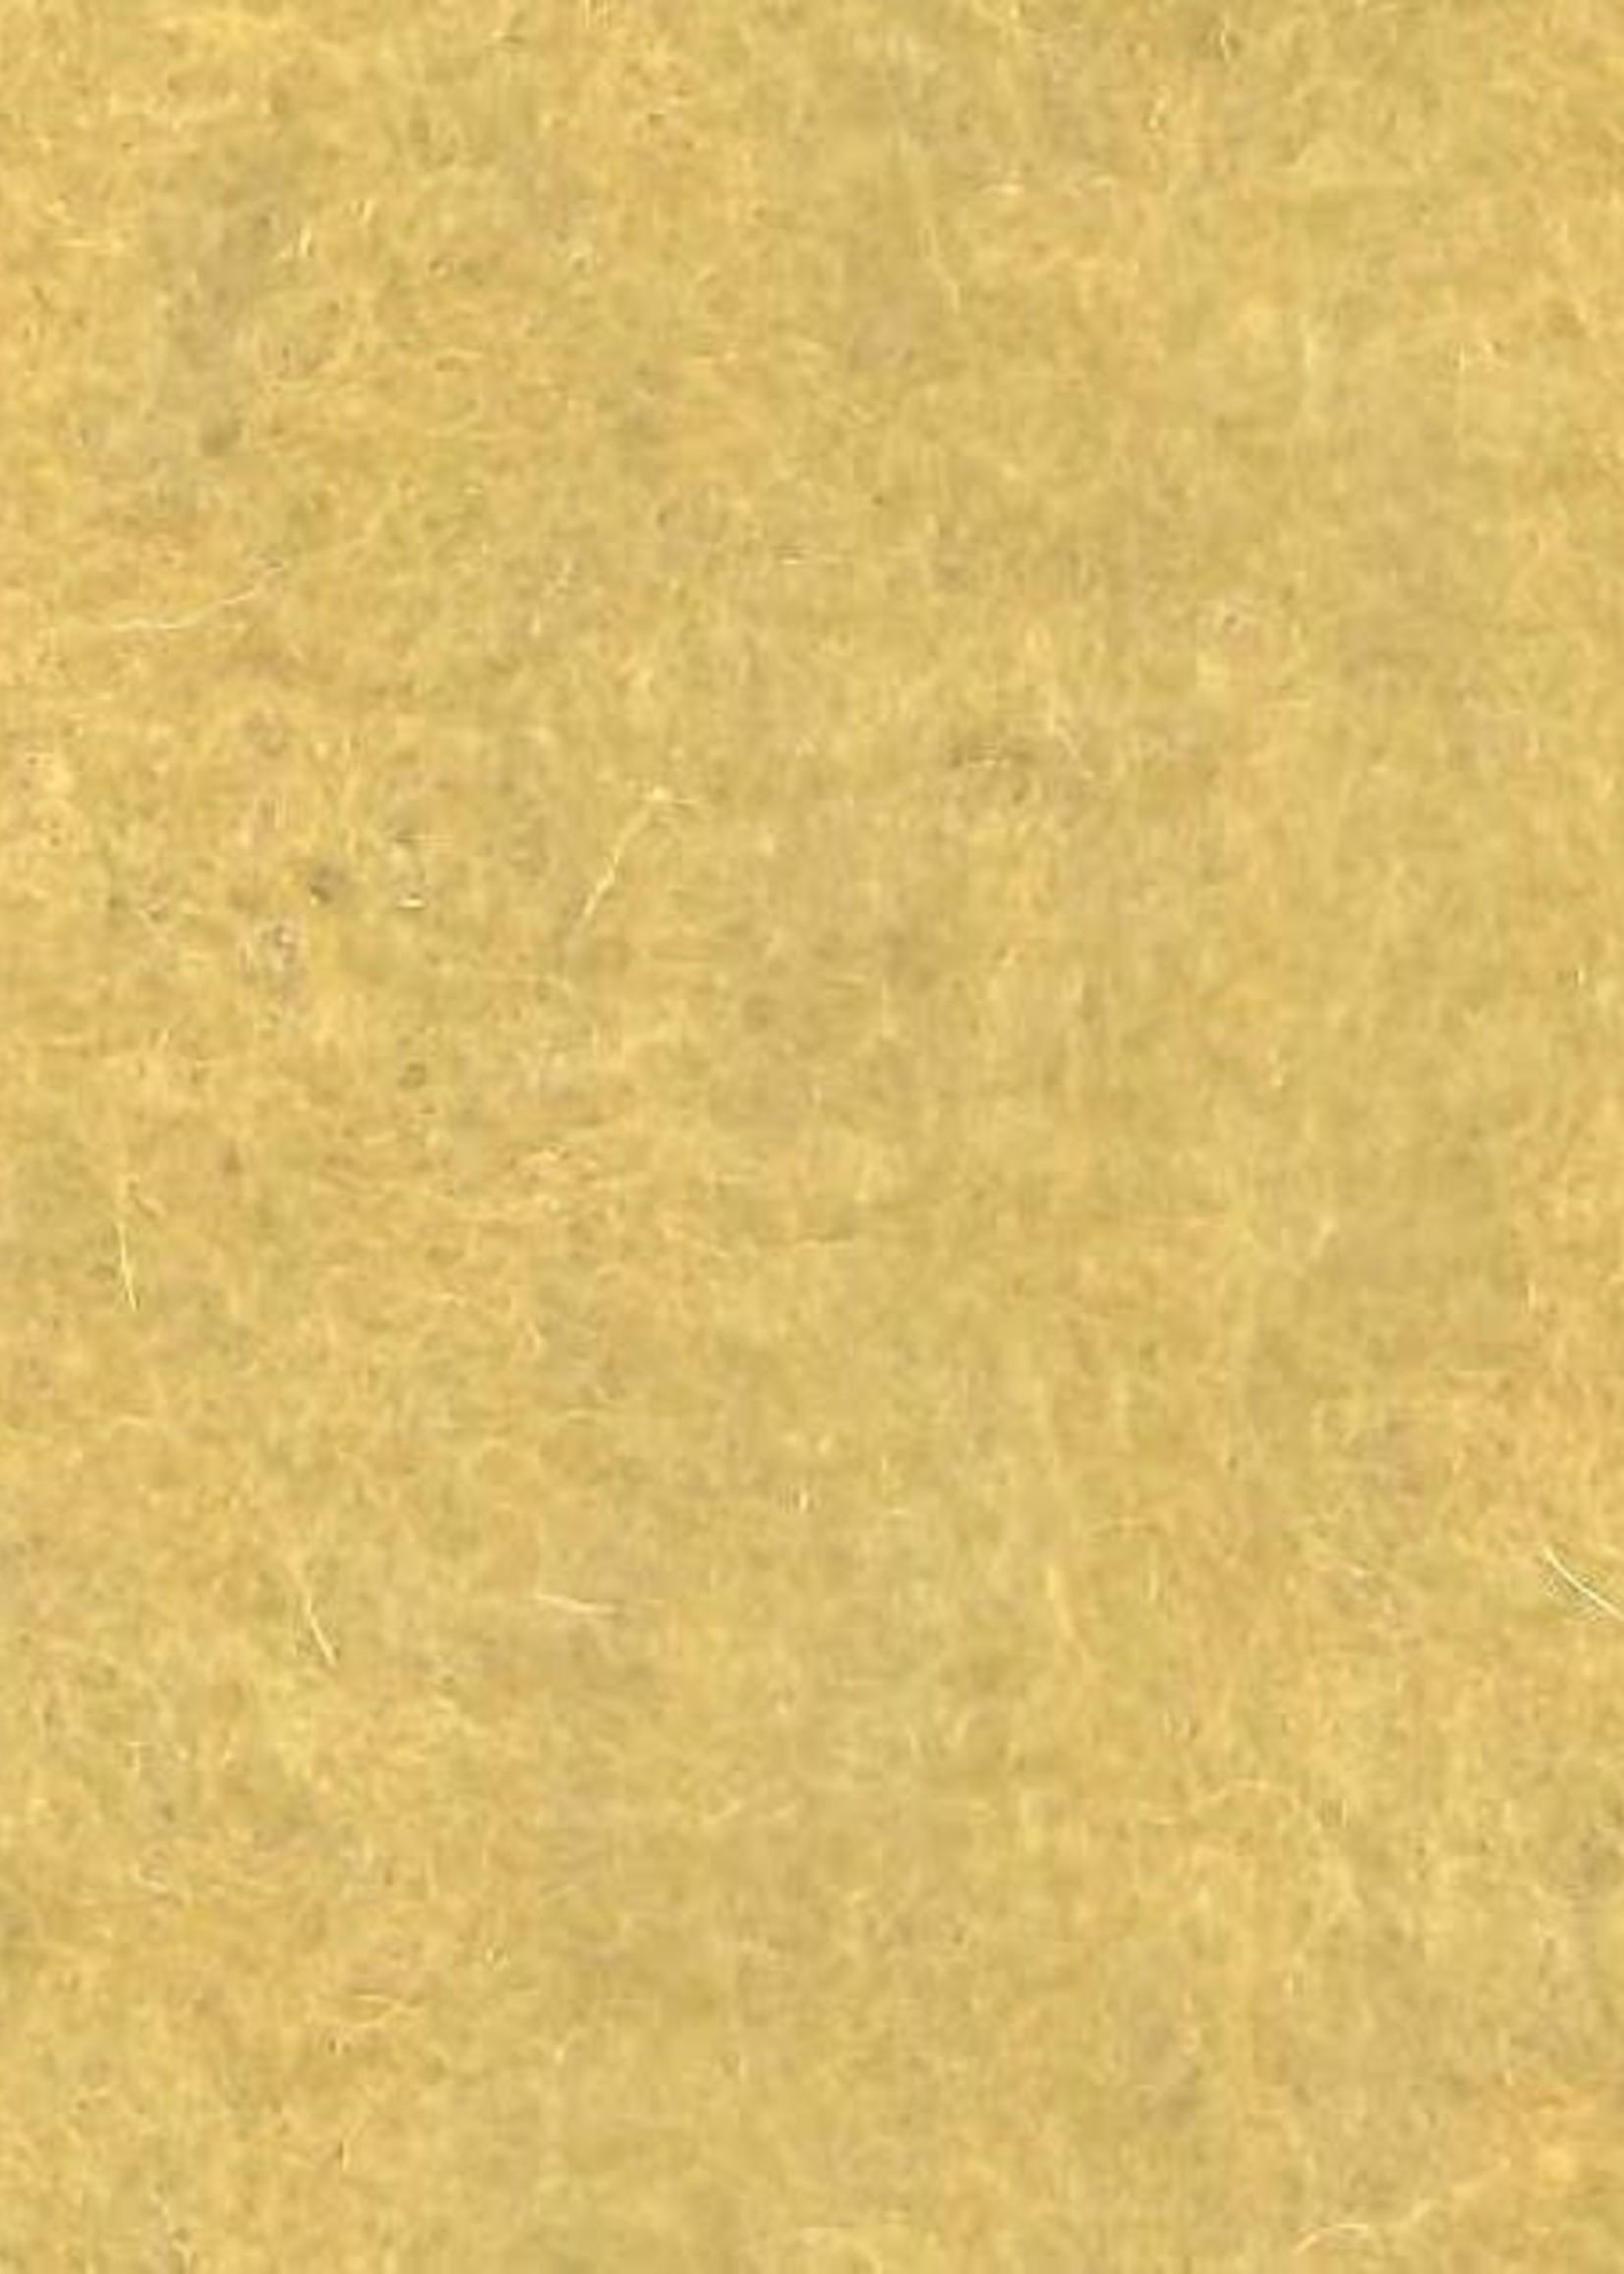 Bhedawool Bhedawool #0330 Mustard